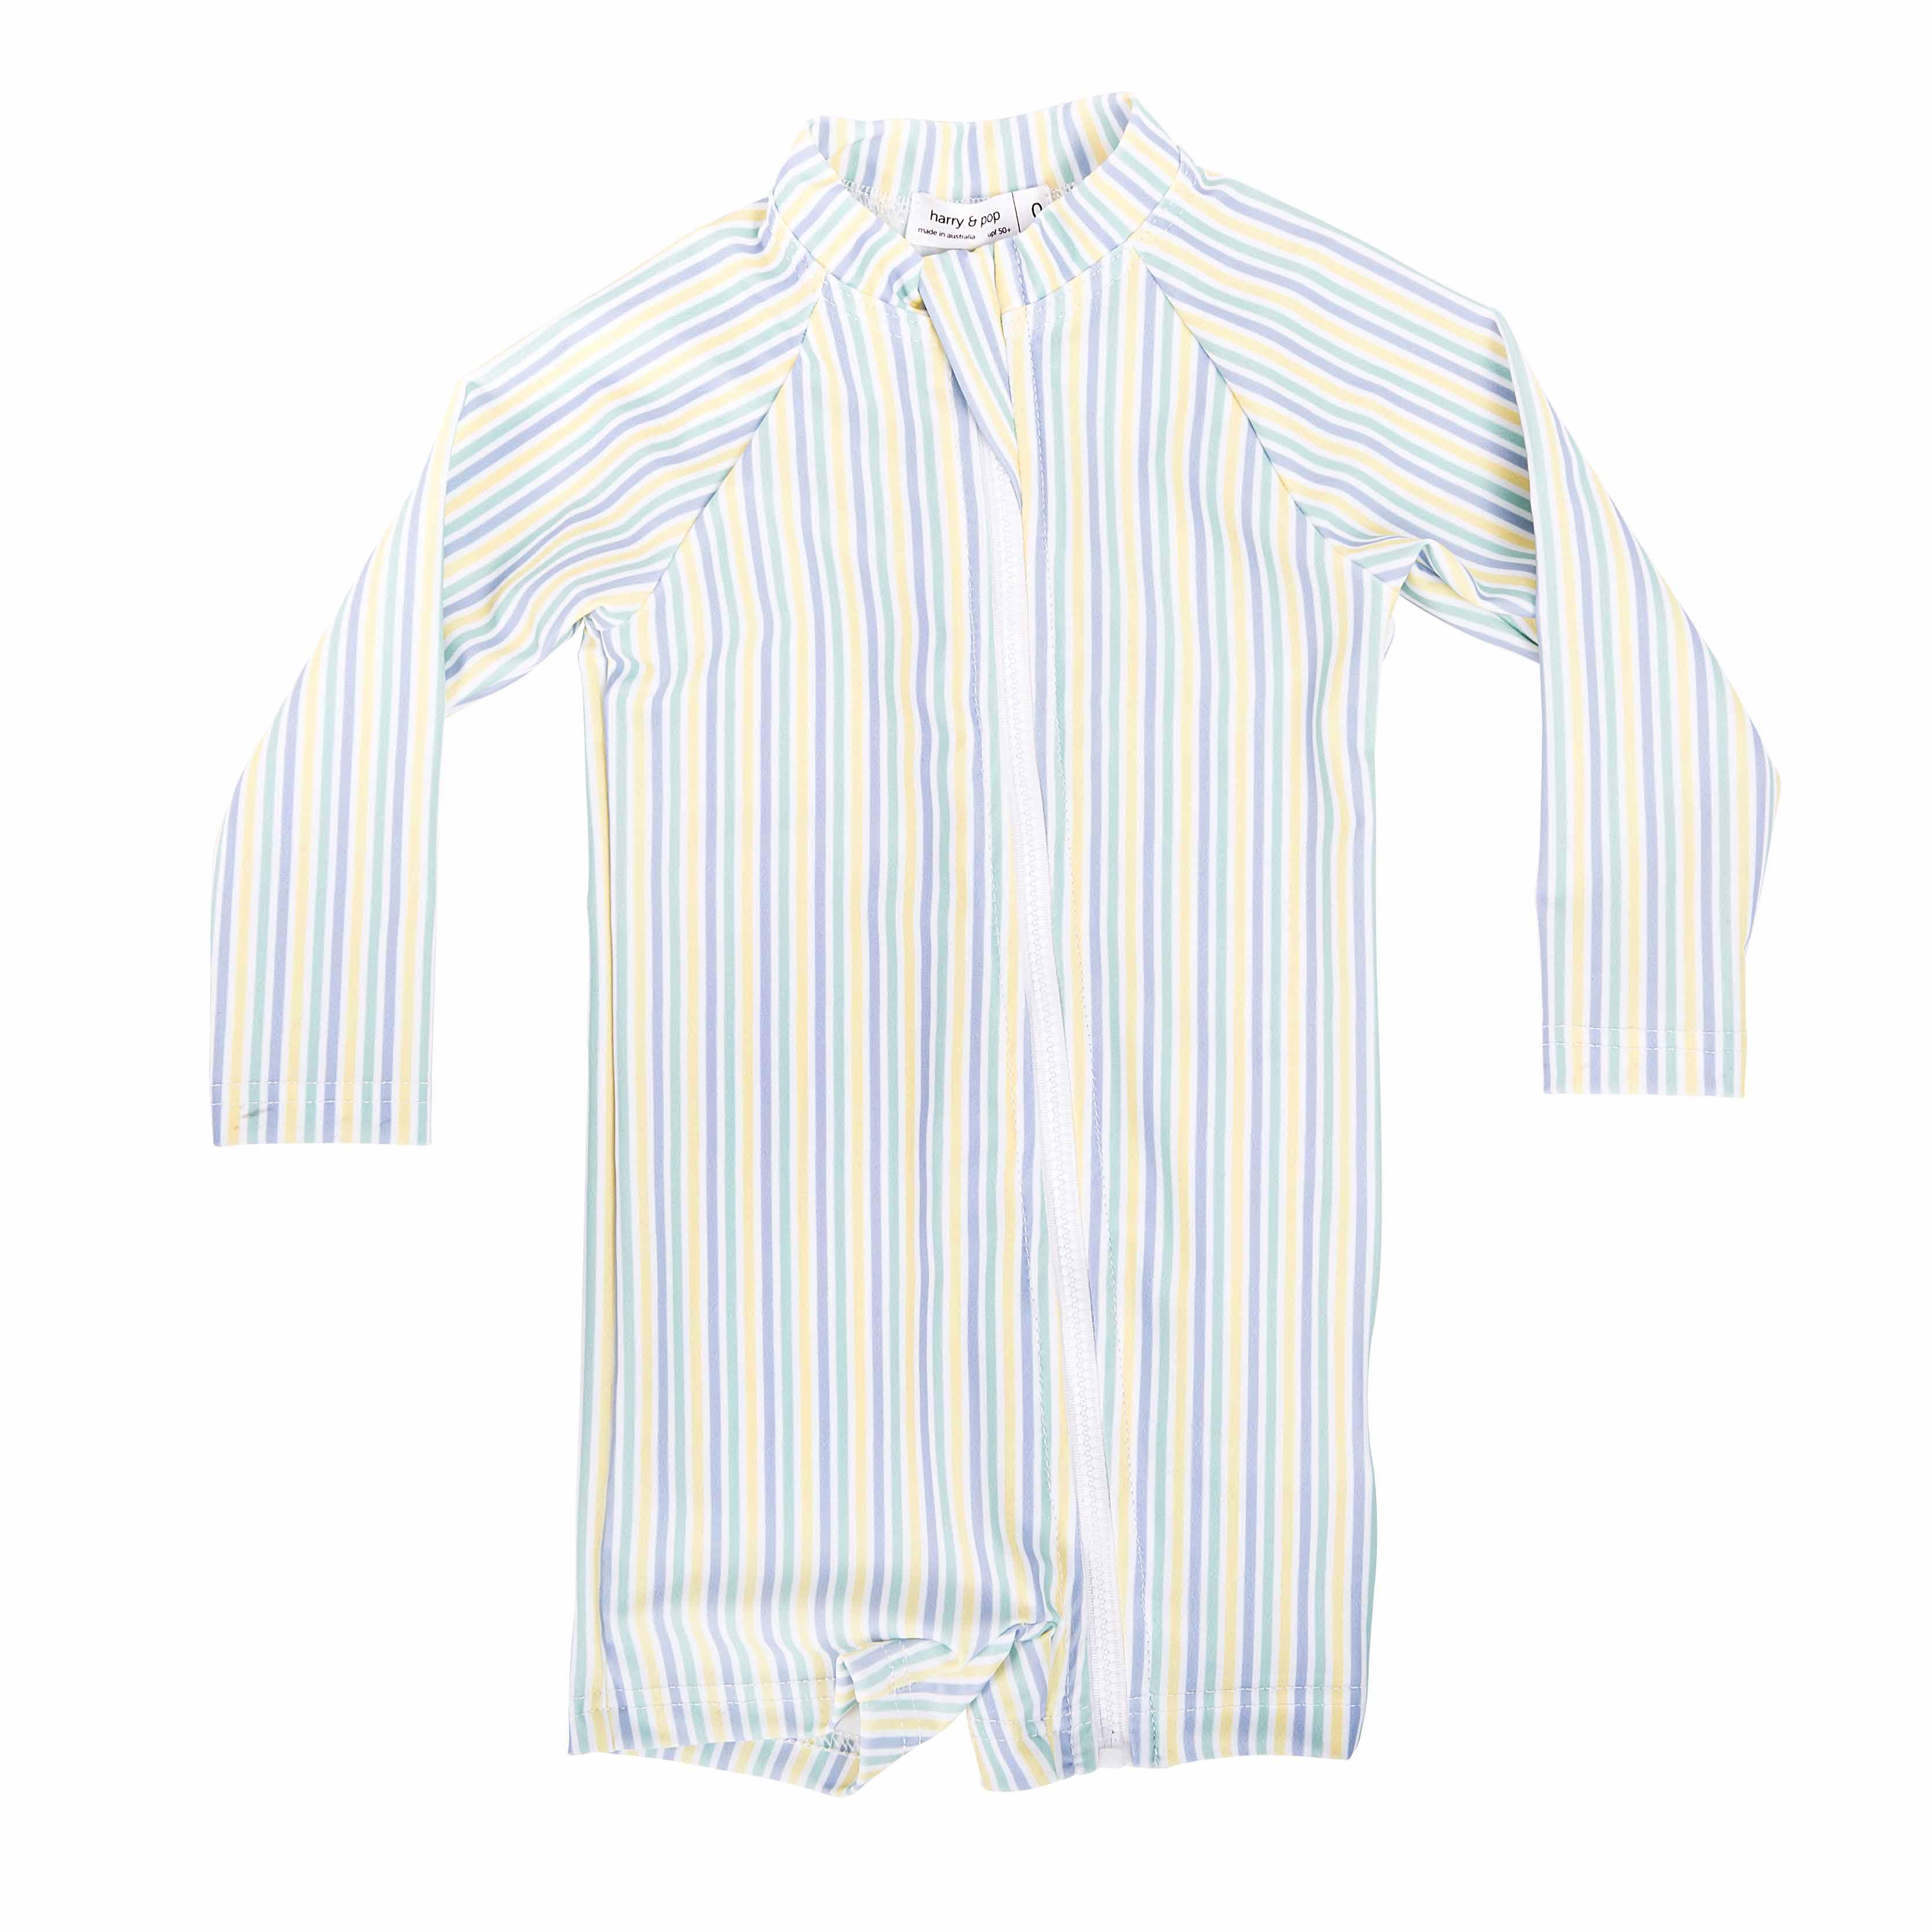 harry & pop Bondi Blue Stripe Sunsuit